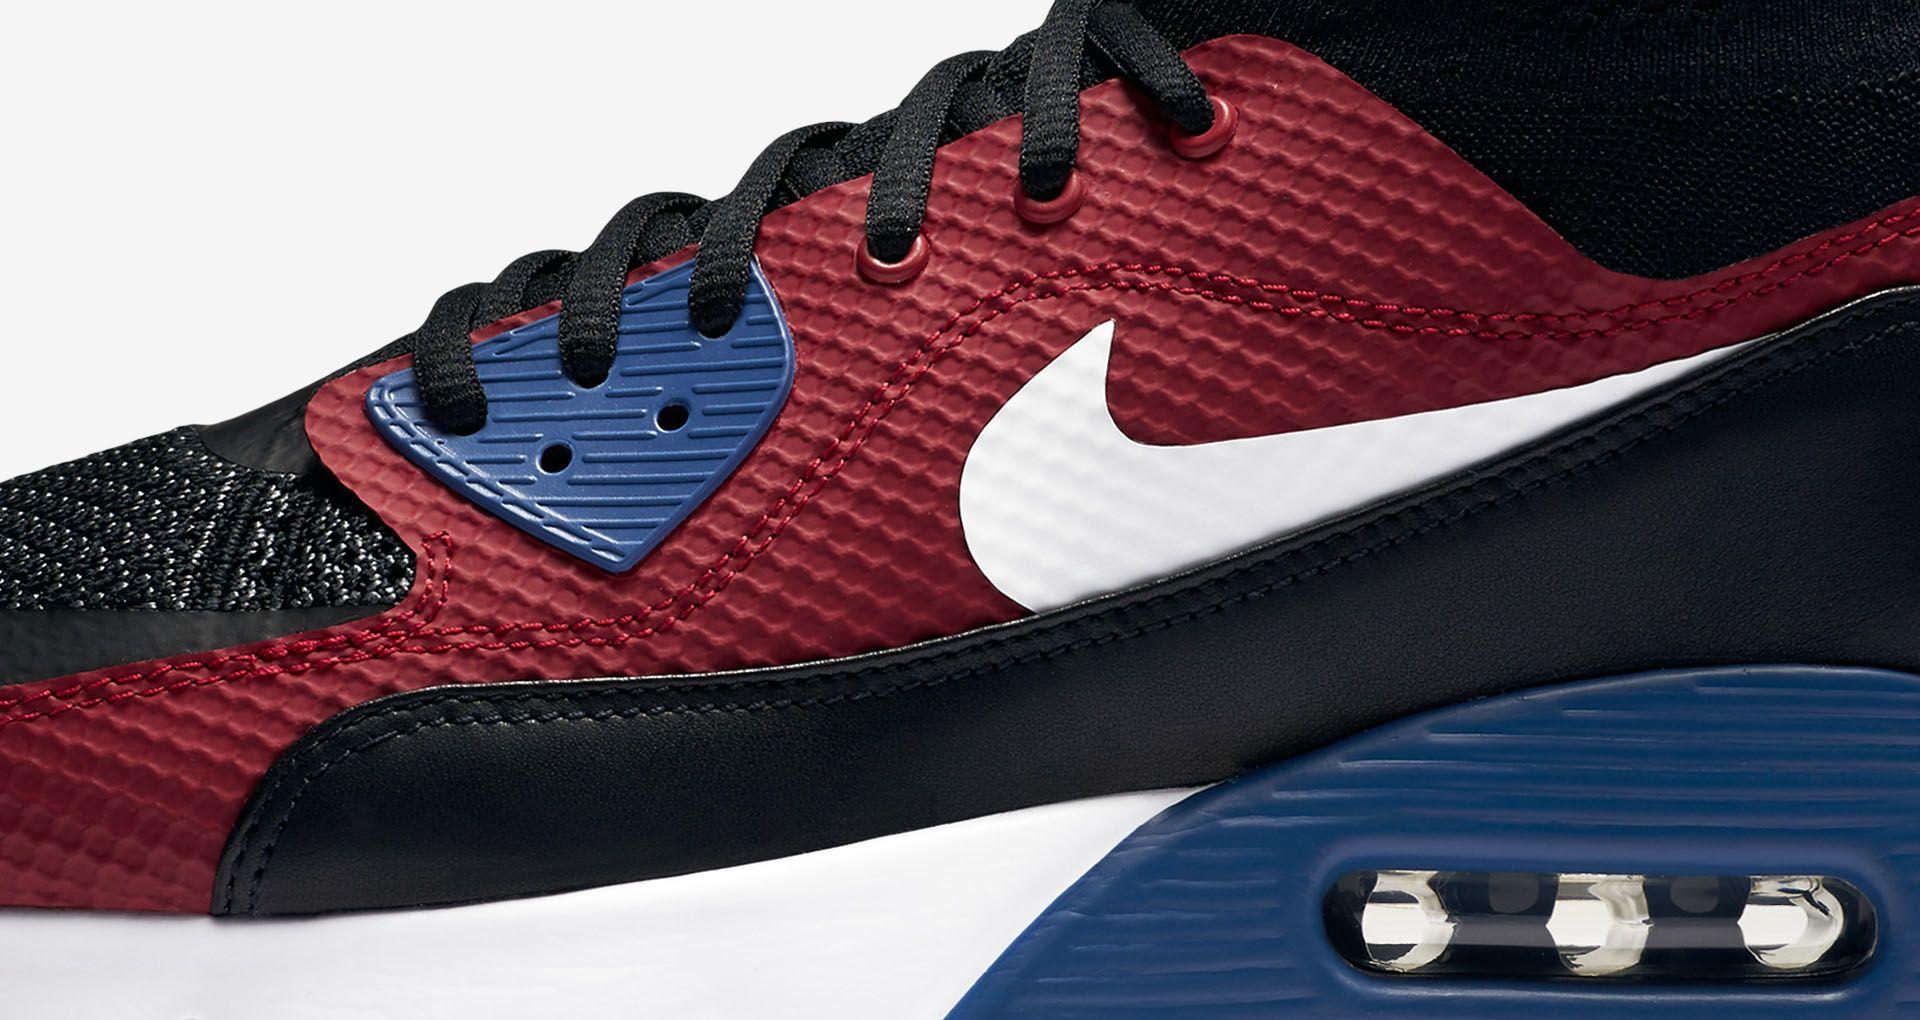 614be79d65 Nike Air Max 90 Ultra Superfly T 'Tinker Hatfield'. Nike+ SNKRS